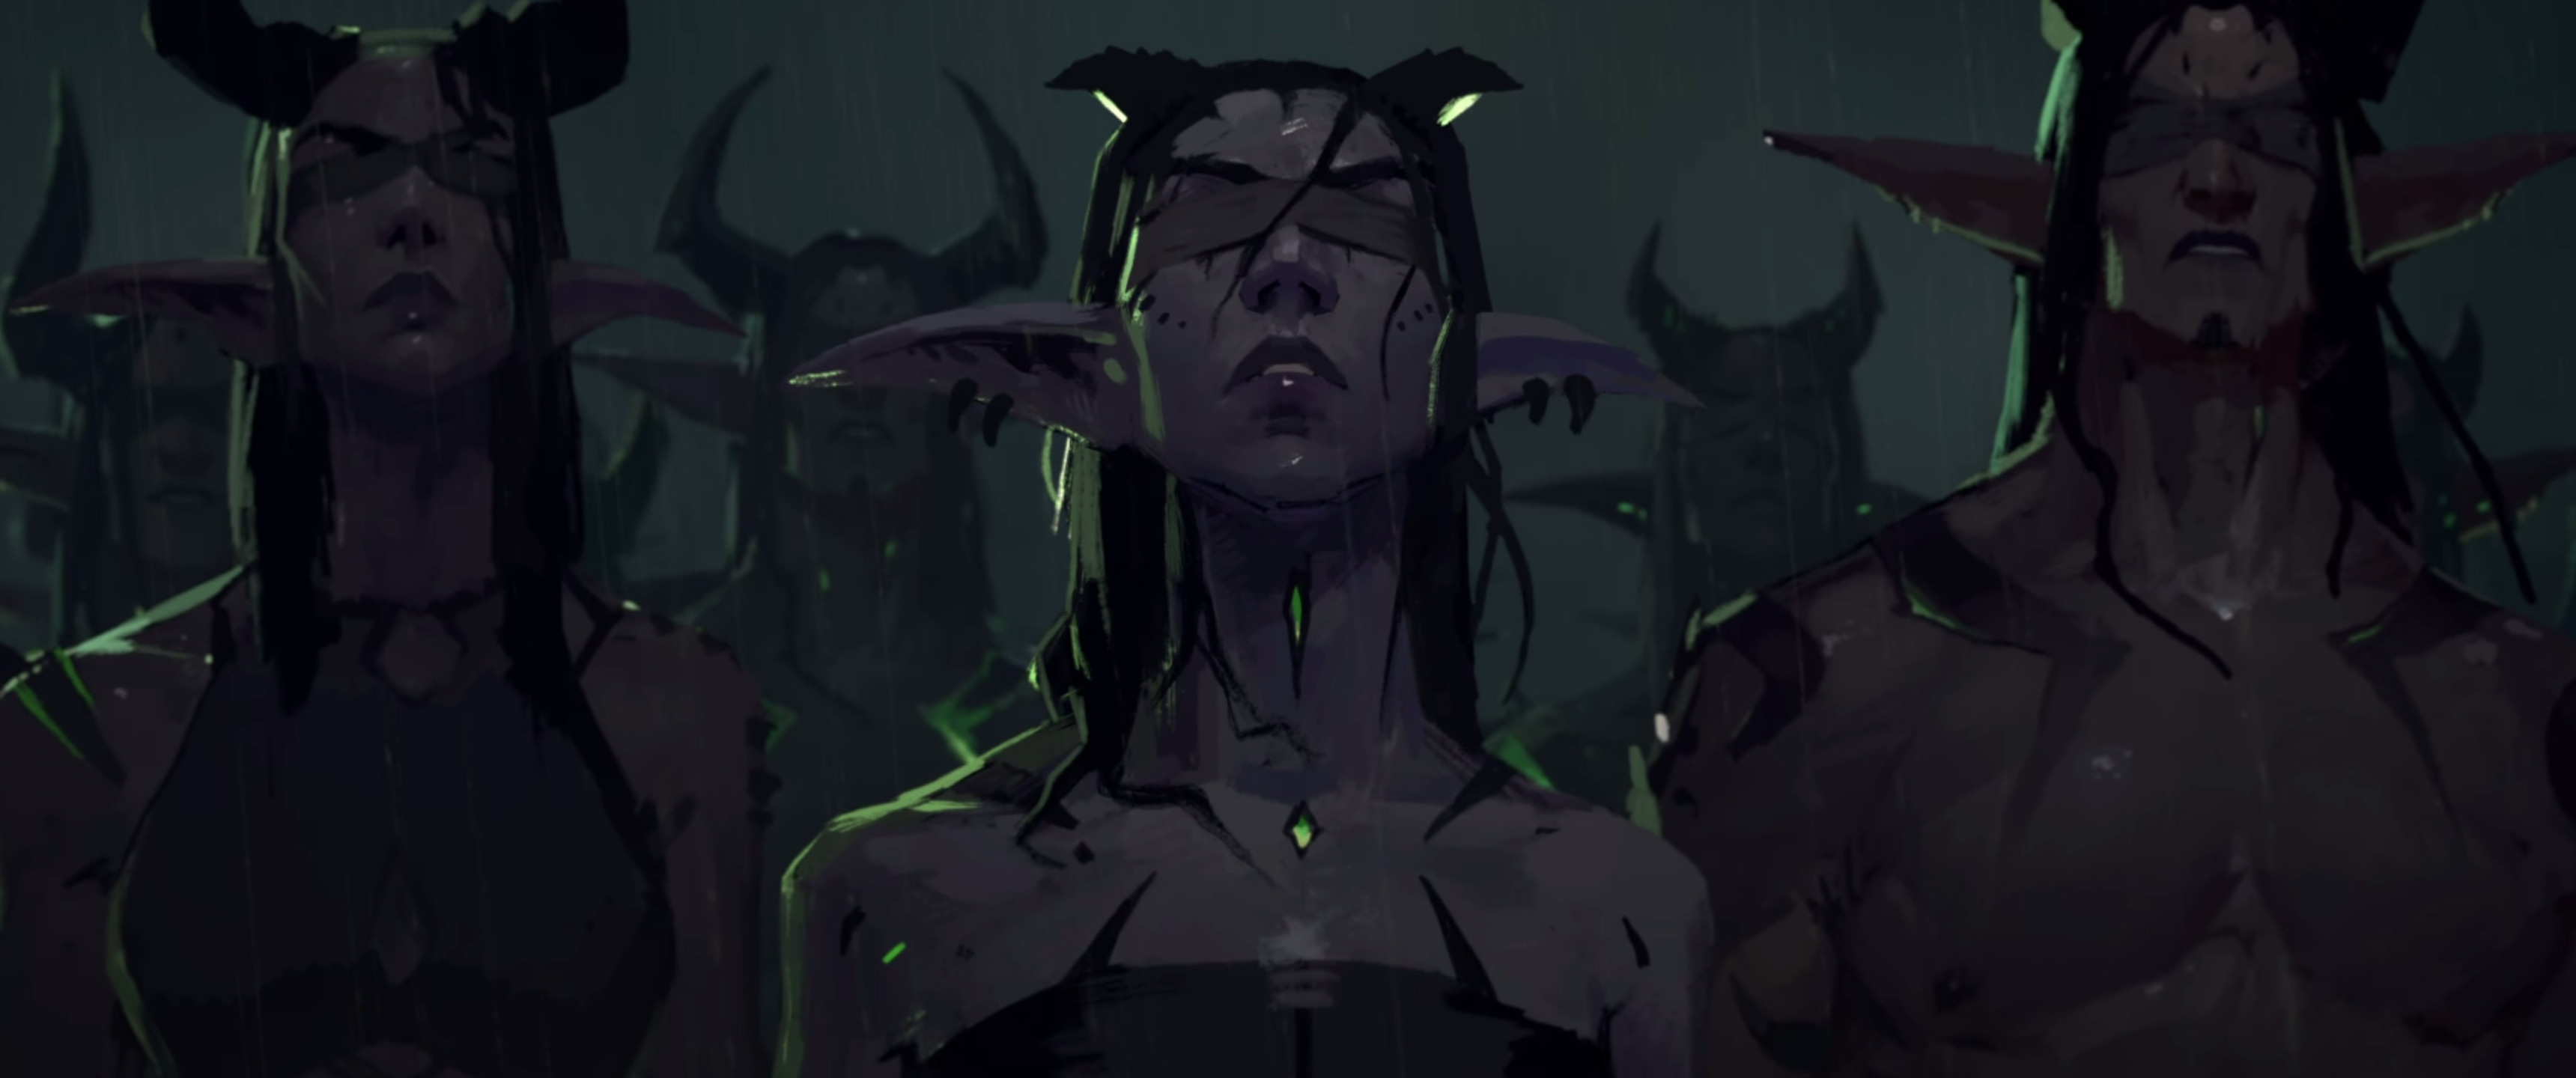 General World of Warcraft Blizzard Entertainment Demon Hunter